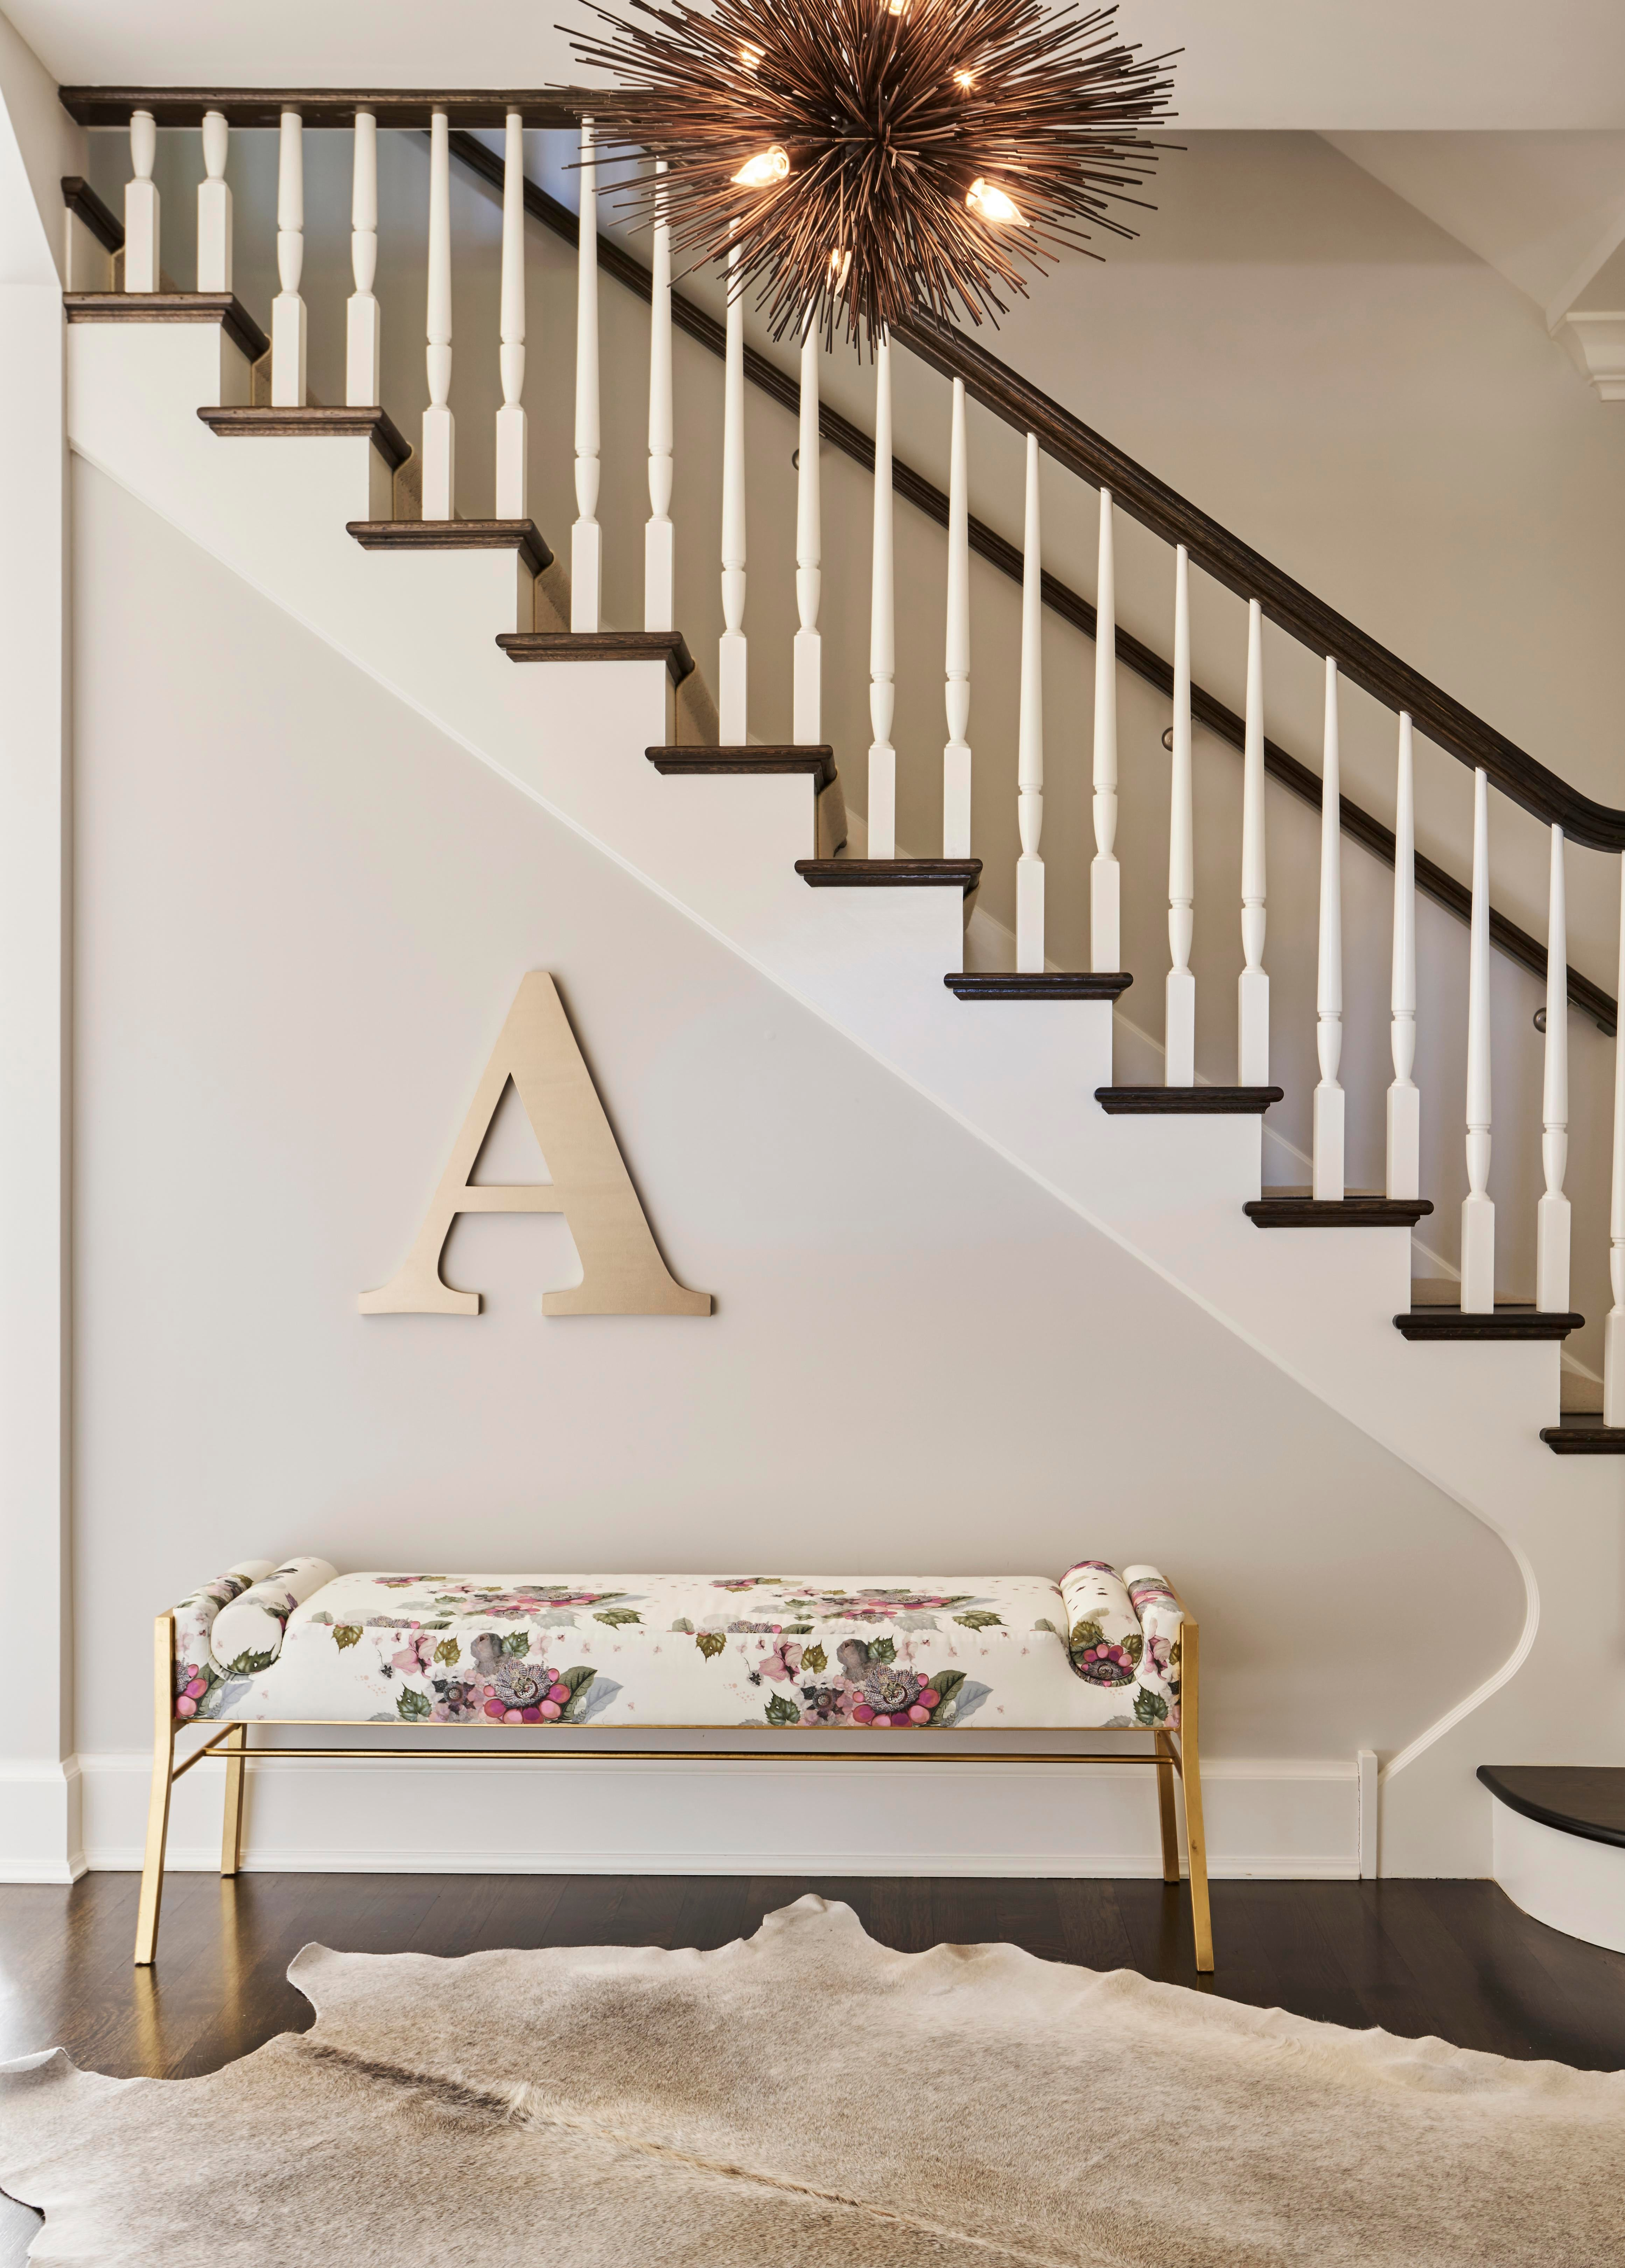 Winnetka Home, Unique Hallway Decor With Hide Rug And Statement Light  Fixture. Elizabeth Krueger Design